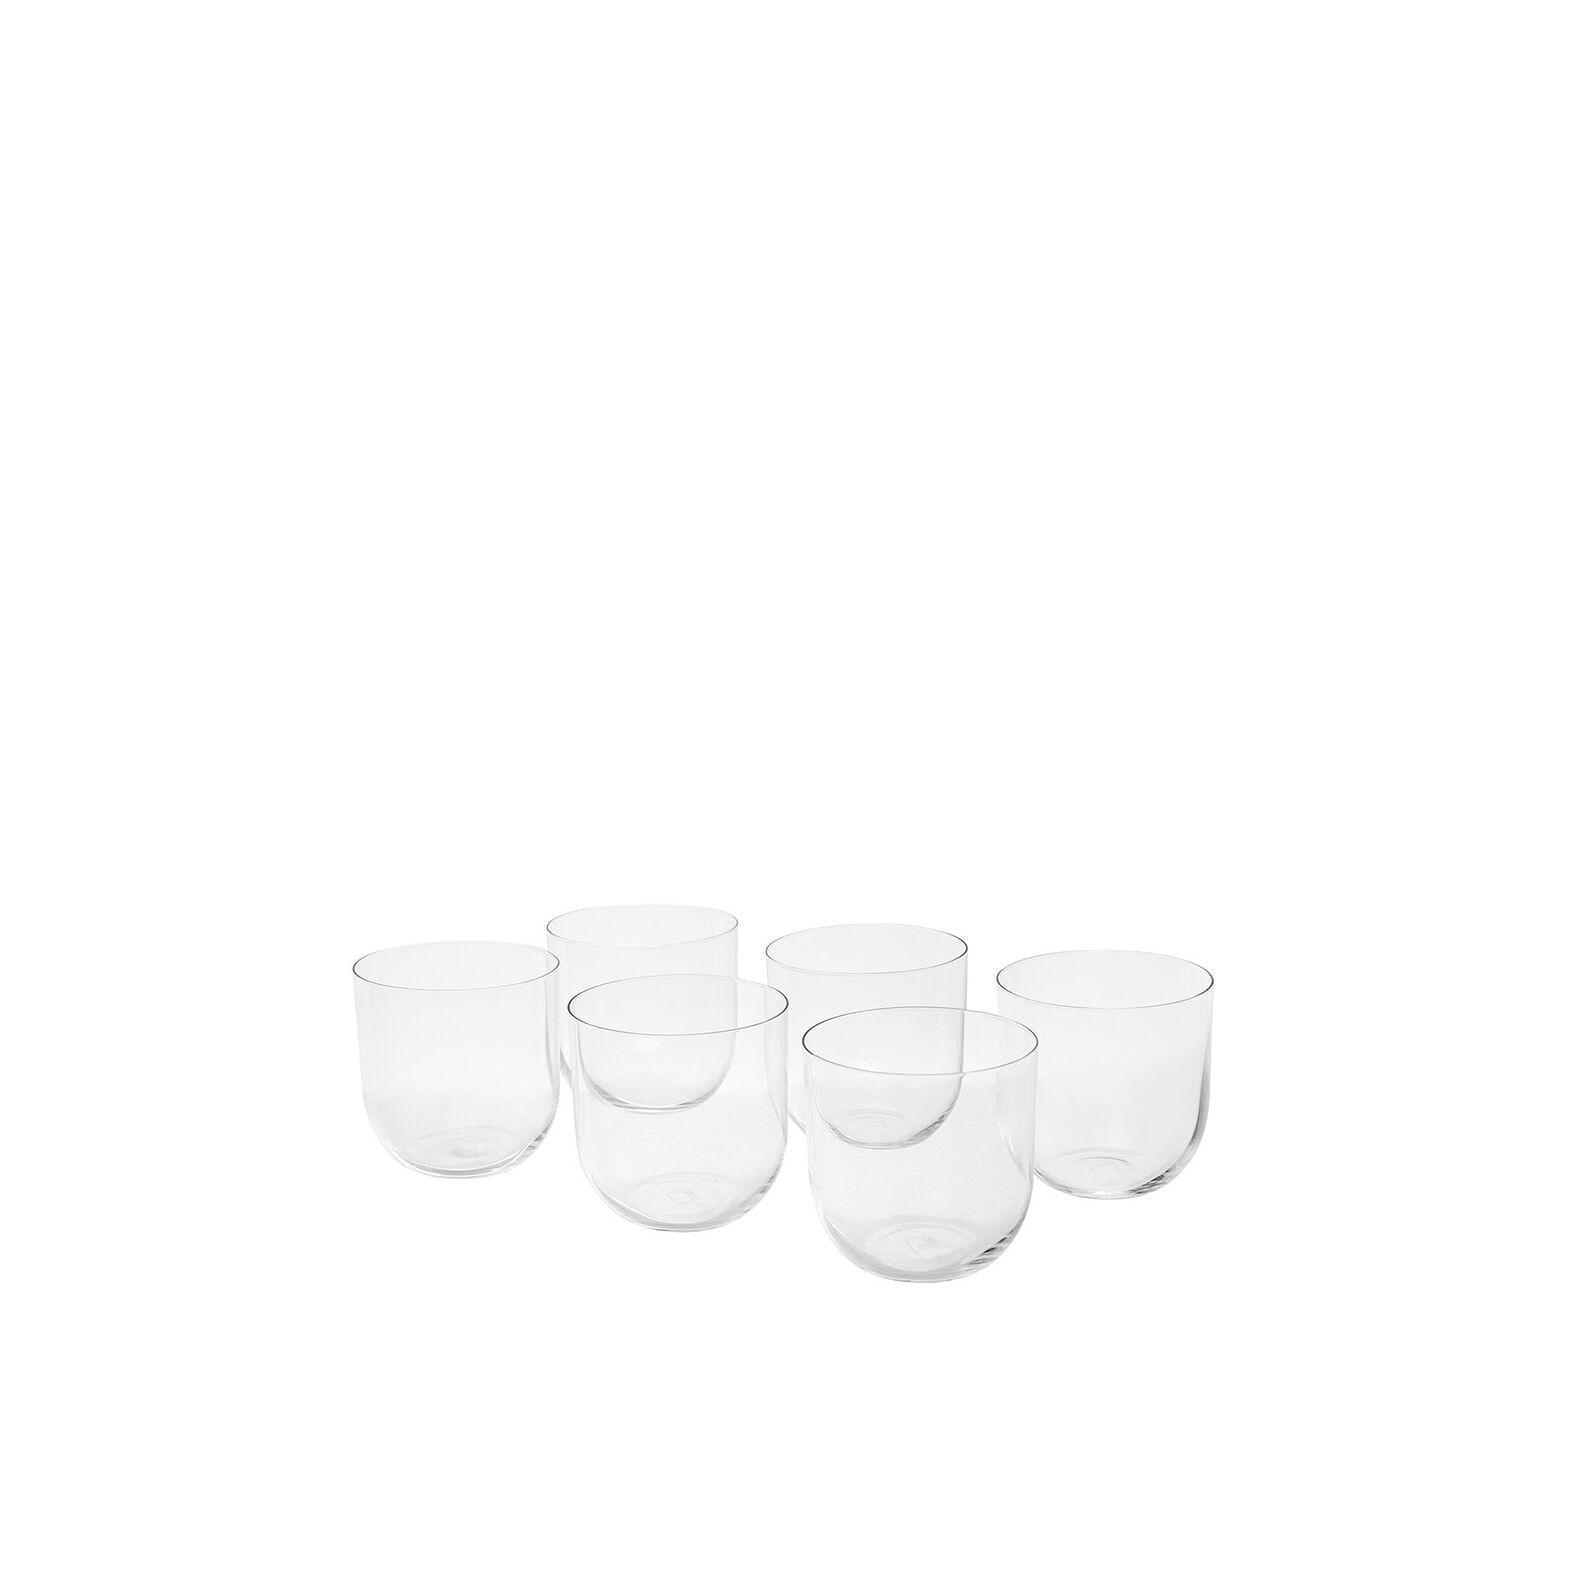 Set of 6 Drop shot glasses